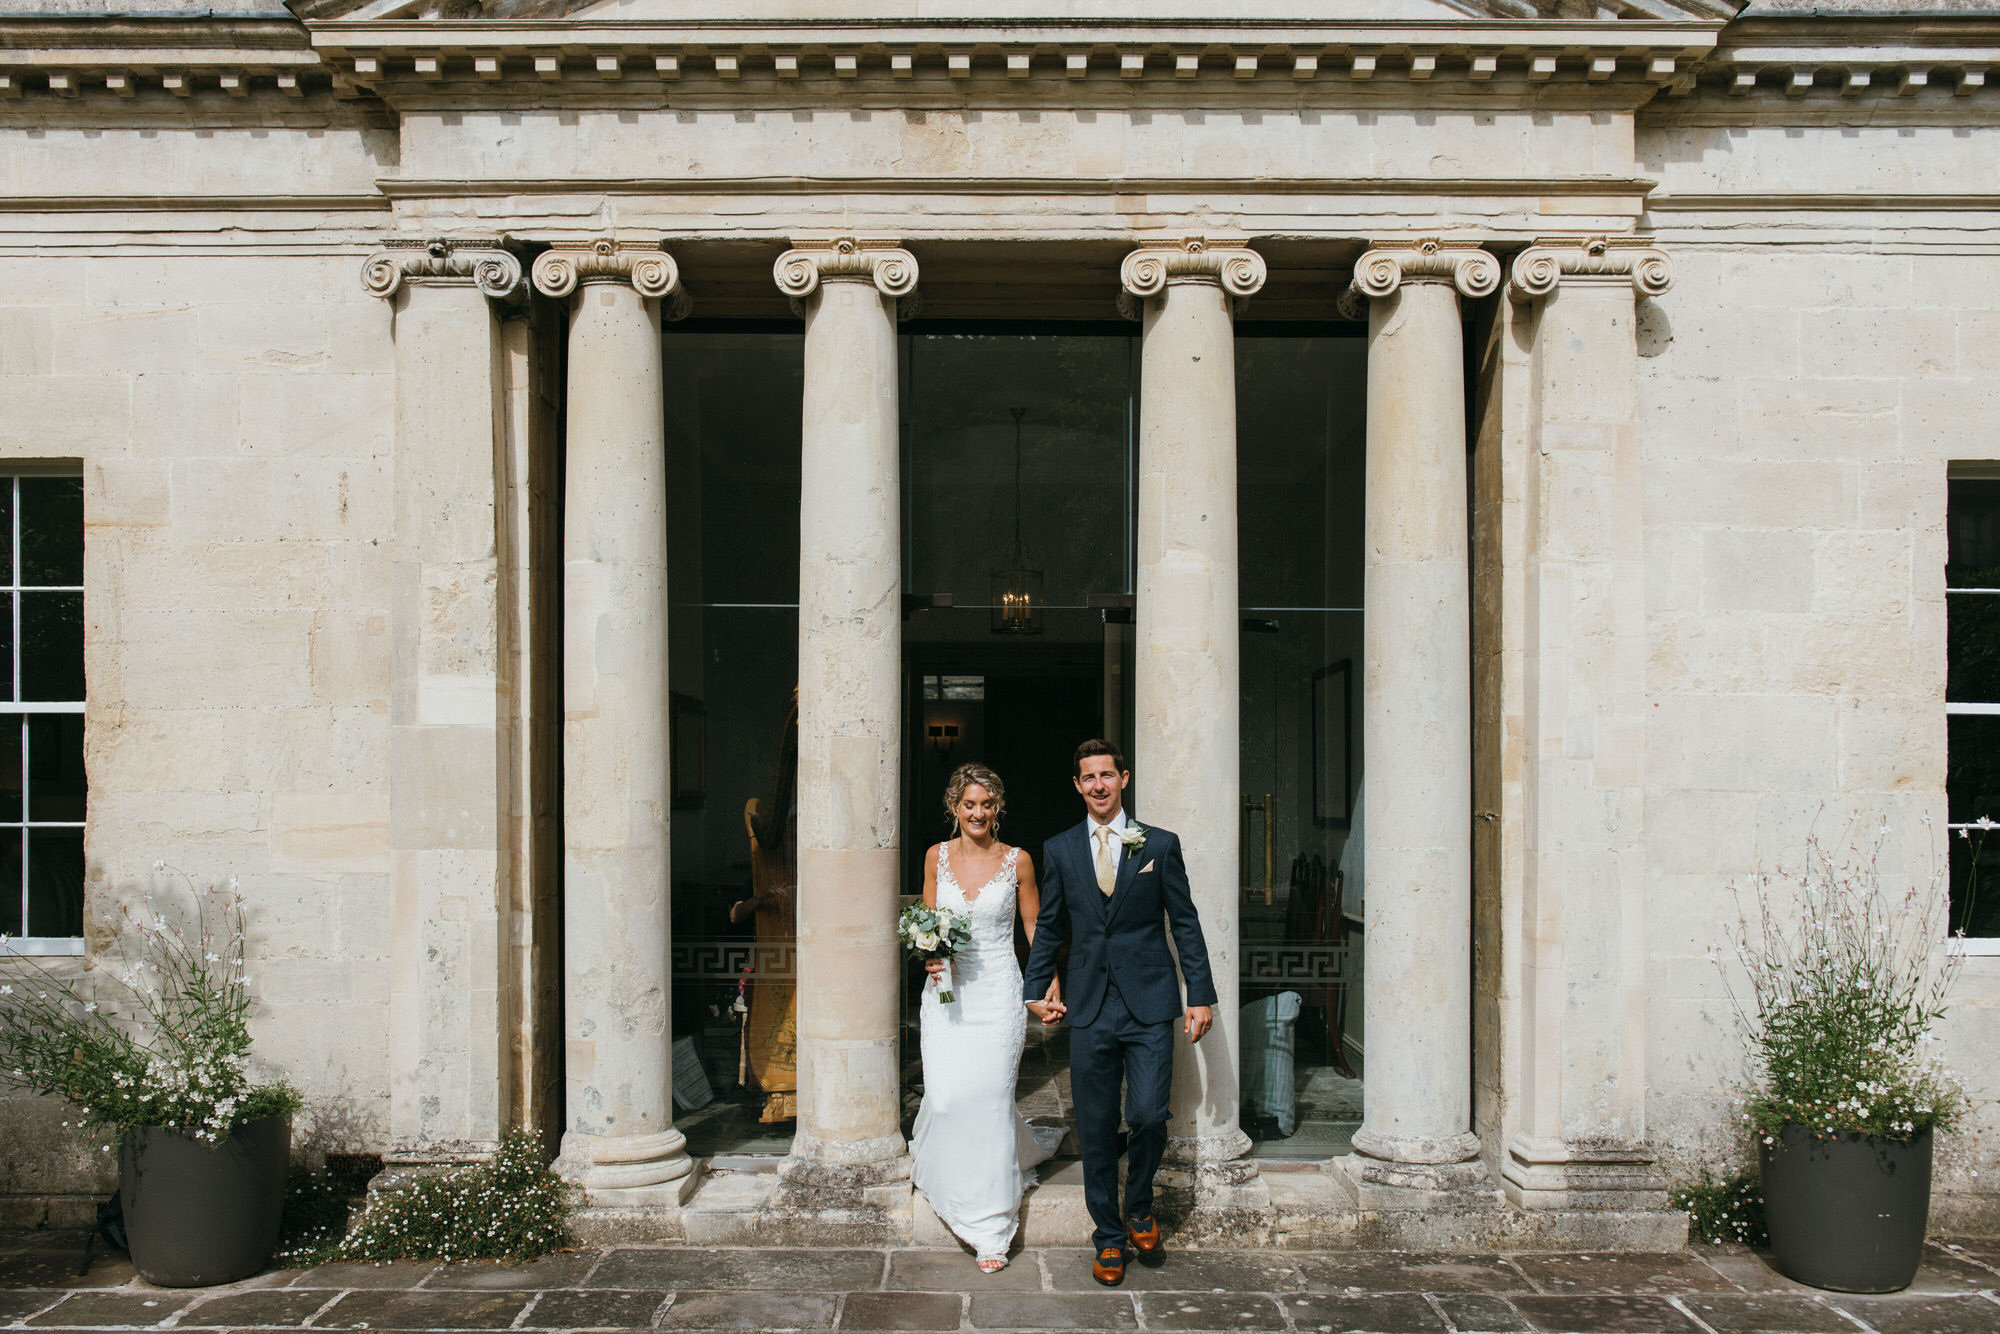 Royal crescent wedding